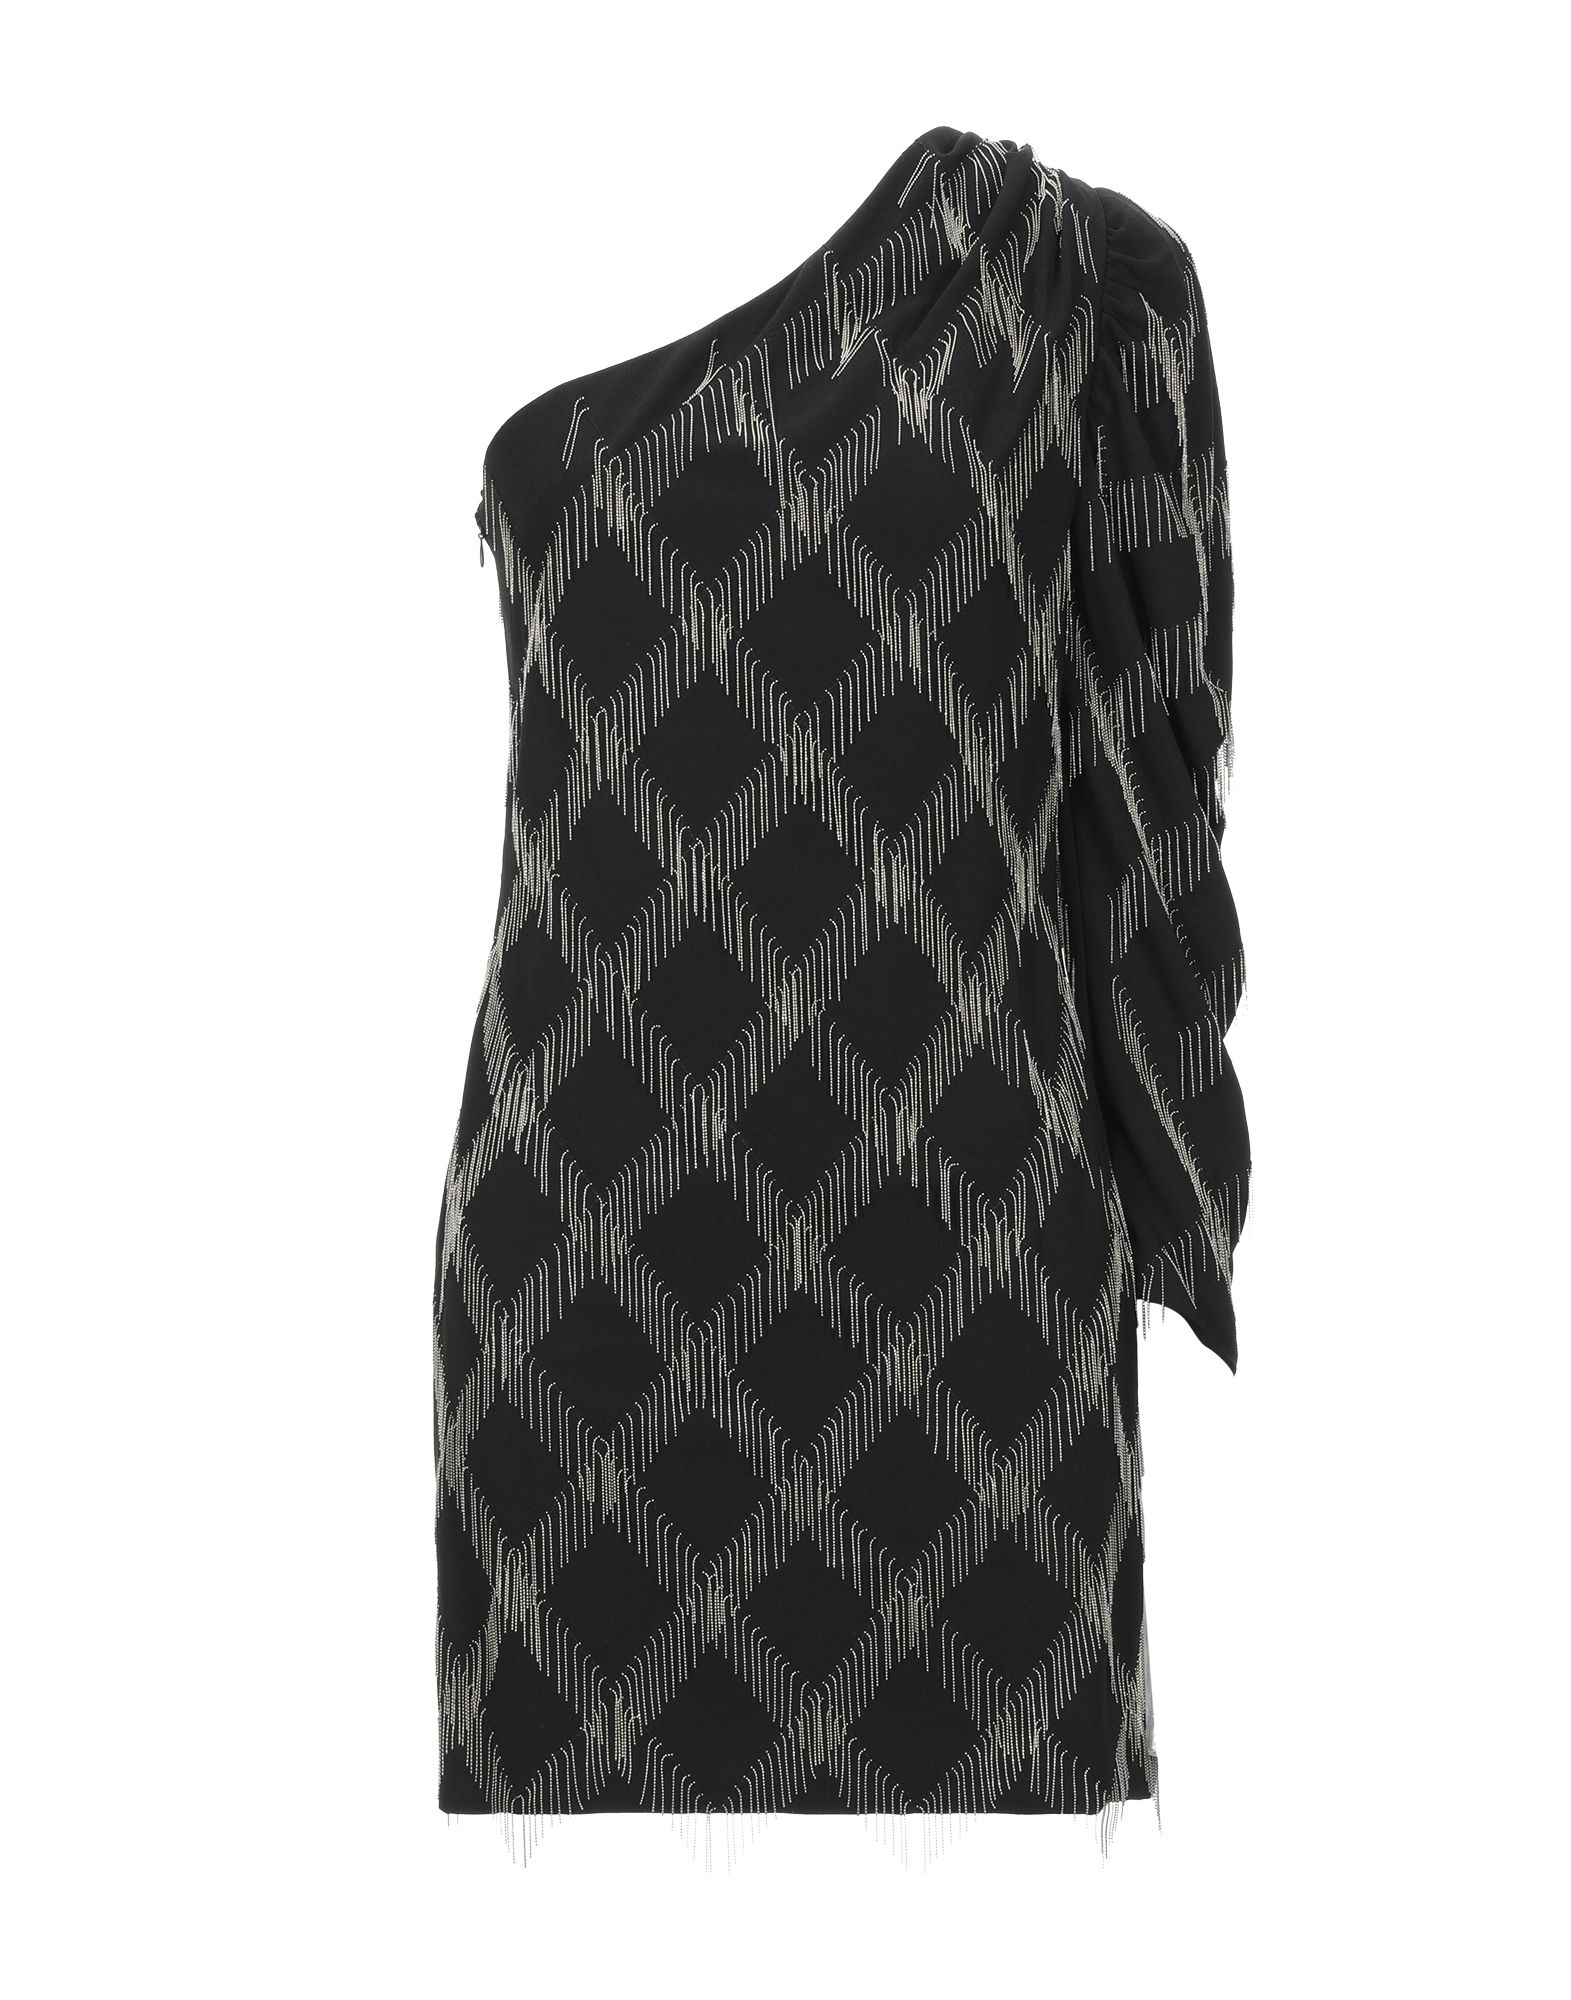 SIMONA CORSELLINI Короткое платье платье коктейльное из одно плечо